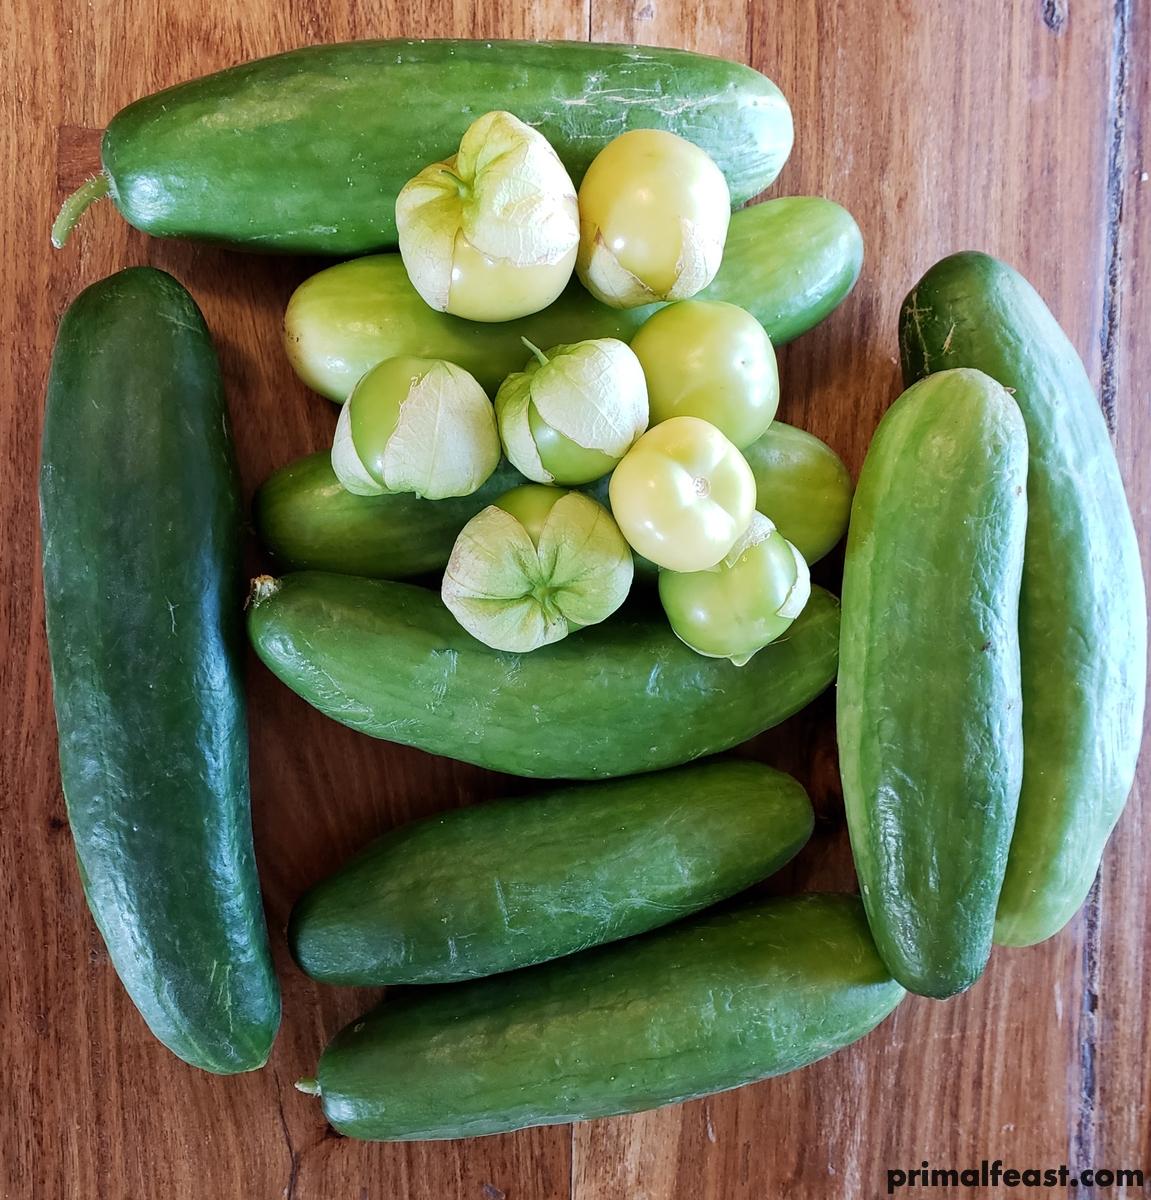 2018 0602 cucumbers tomatillo.jpg